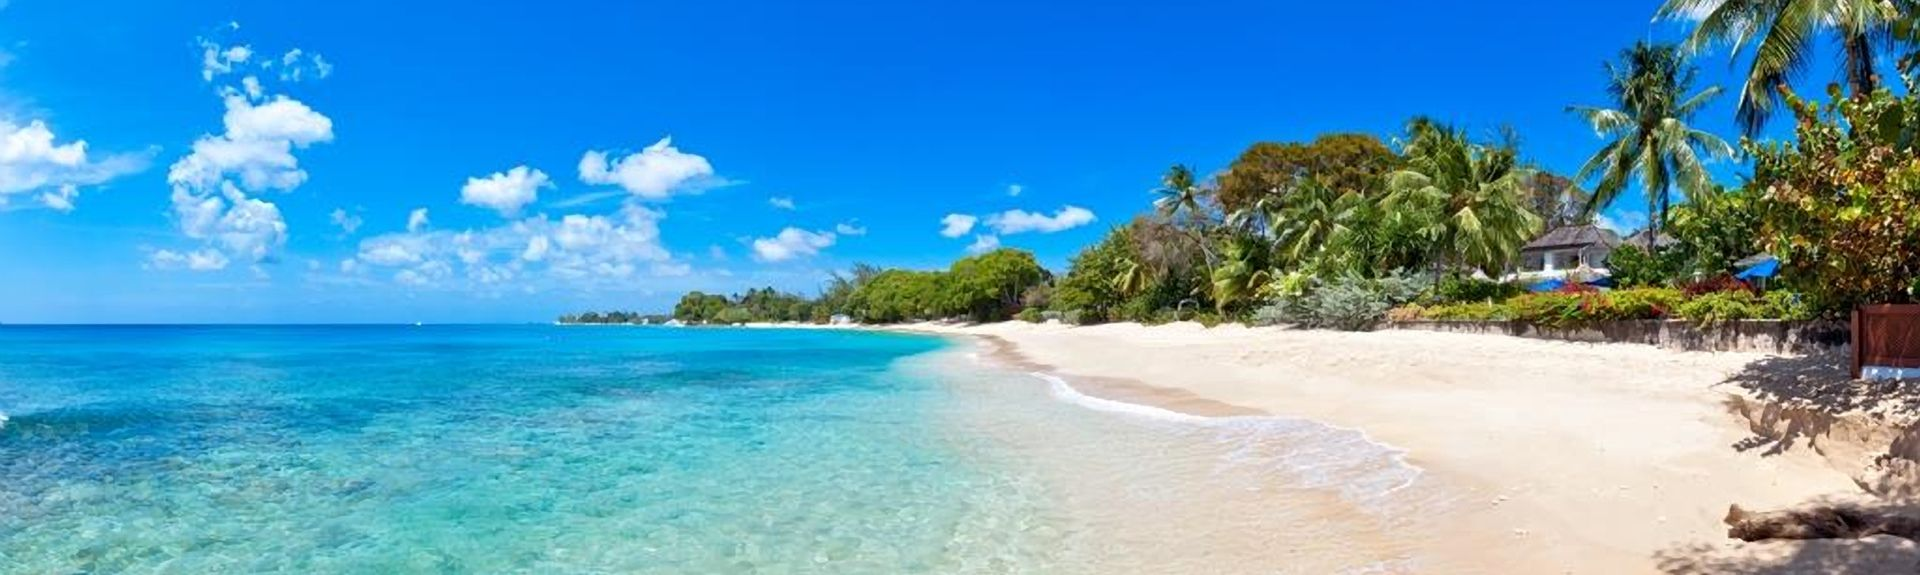 Brighton Beach, Bridgetown, St. Michael, Barbados